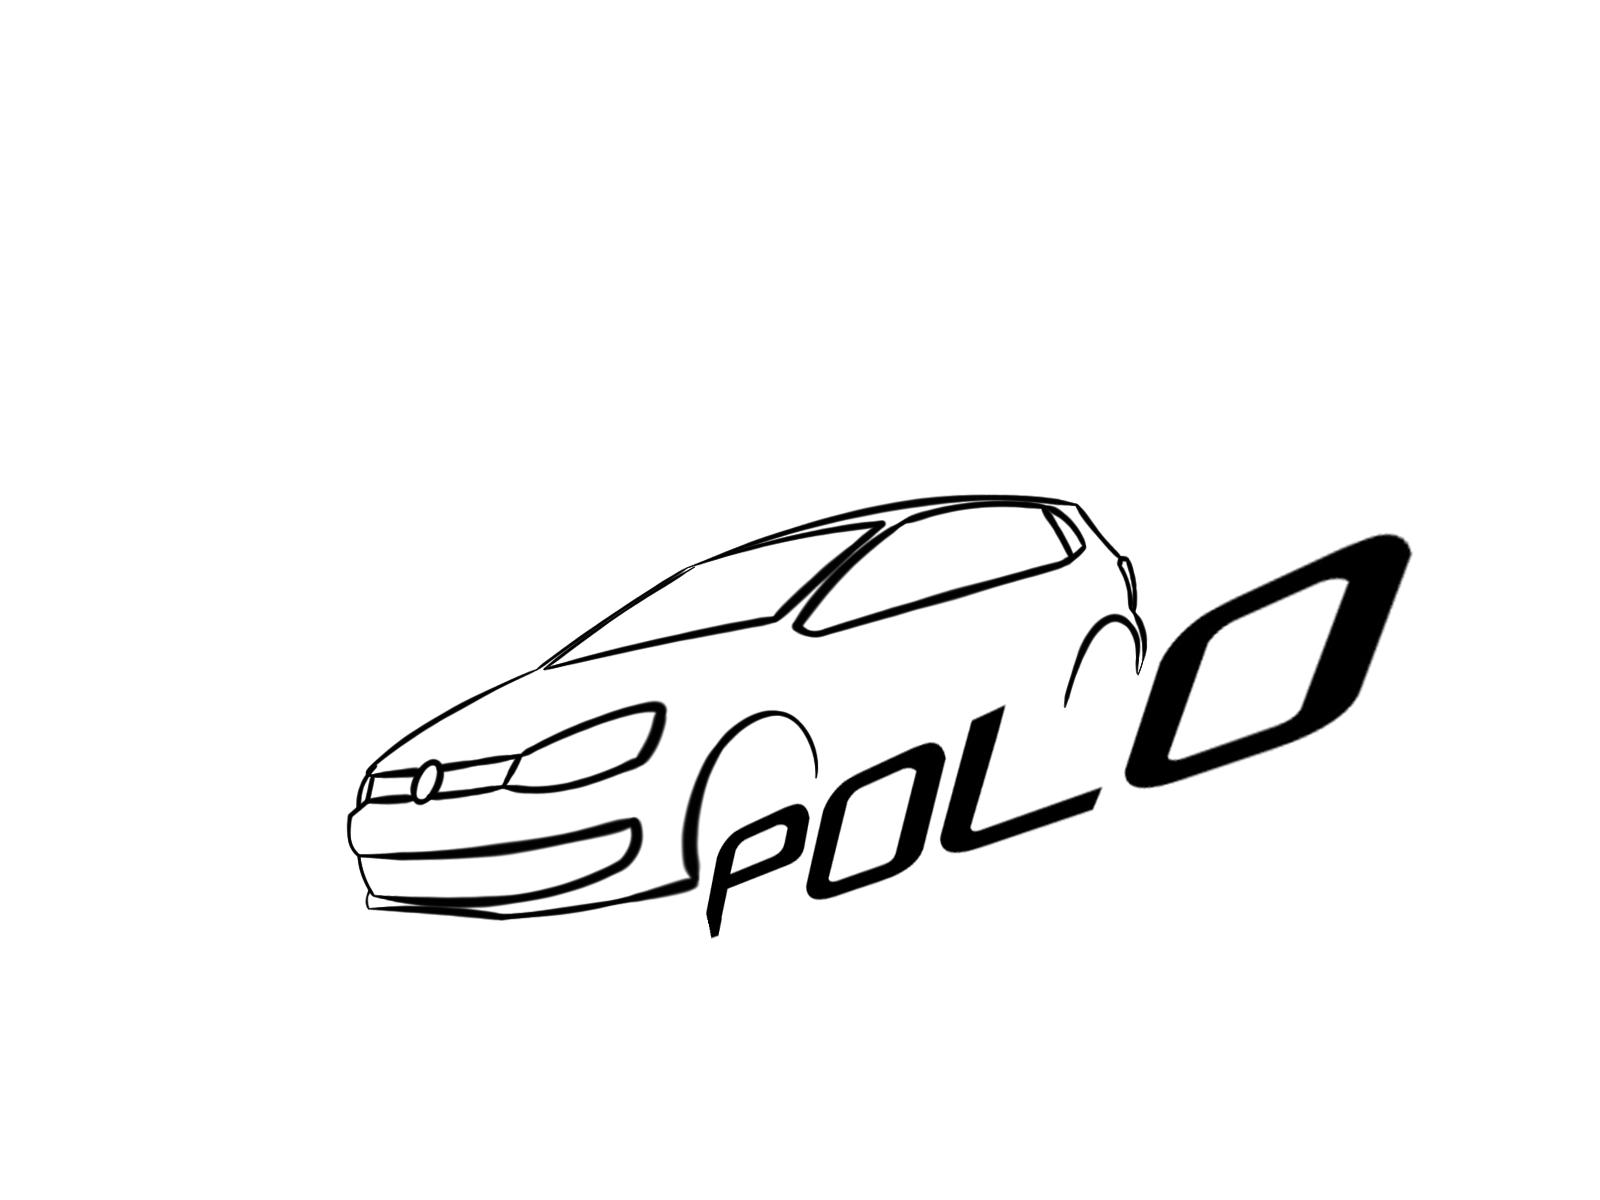 Vw Polo Stylized Logo By Ionut Octavian Dima At Coroflot Com